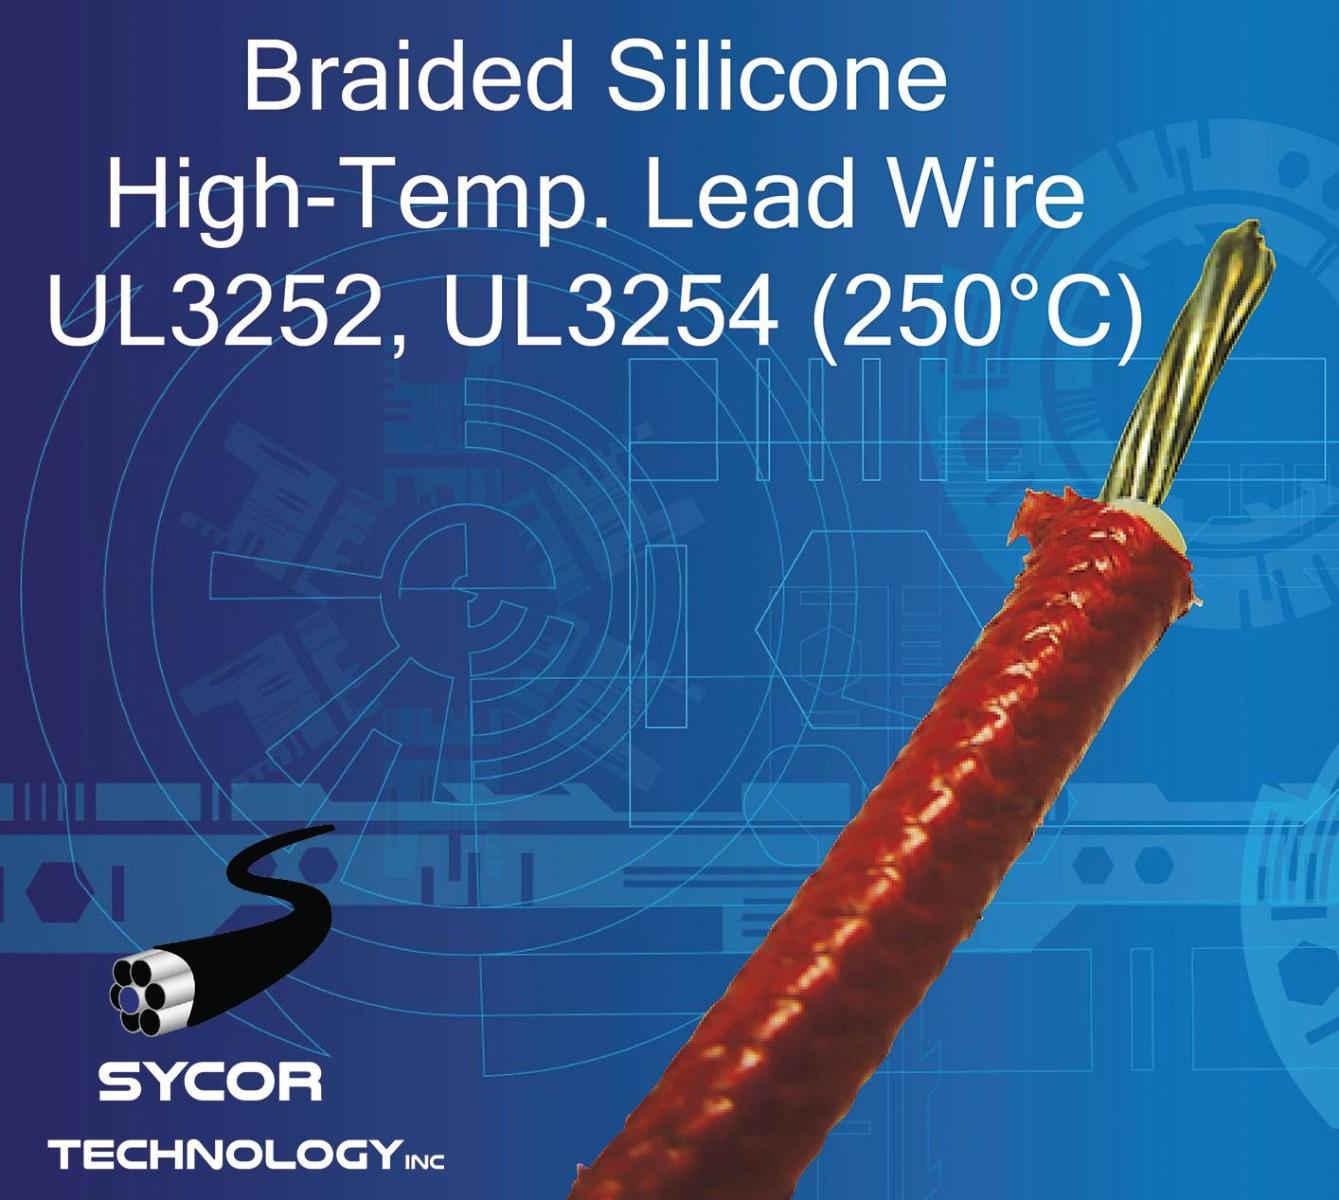 High-Temp. Lead Wire UL3252, UL3254